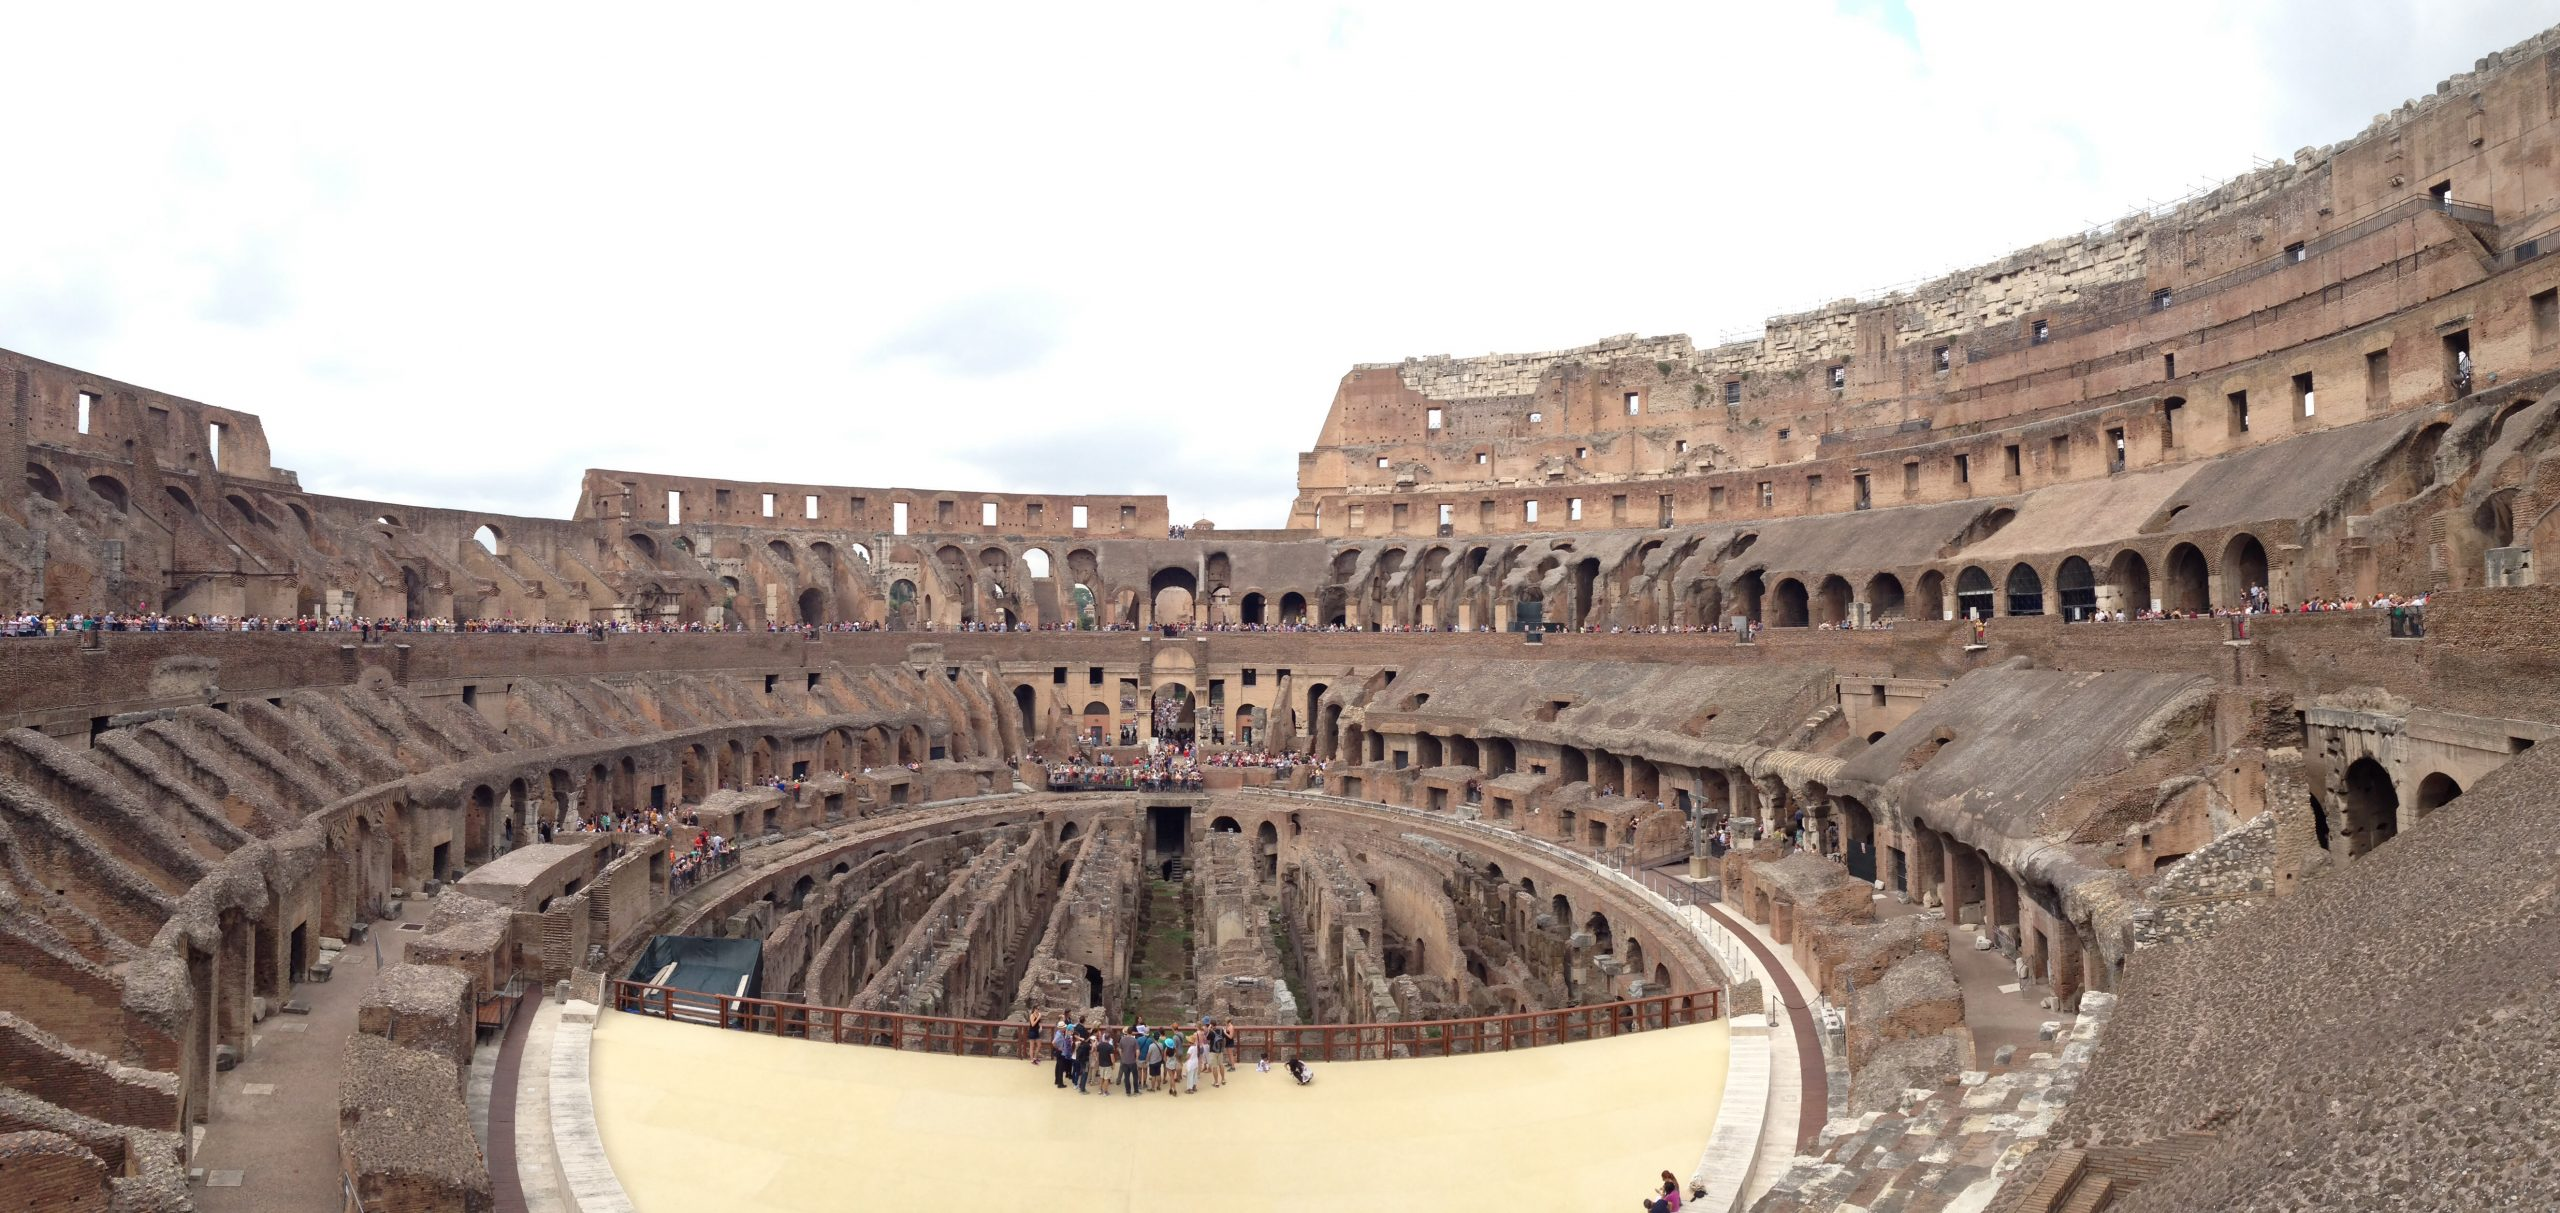 羅馬競技場 Colosseo